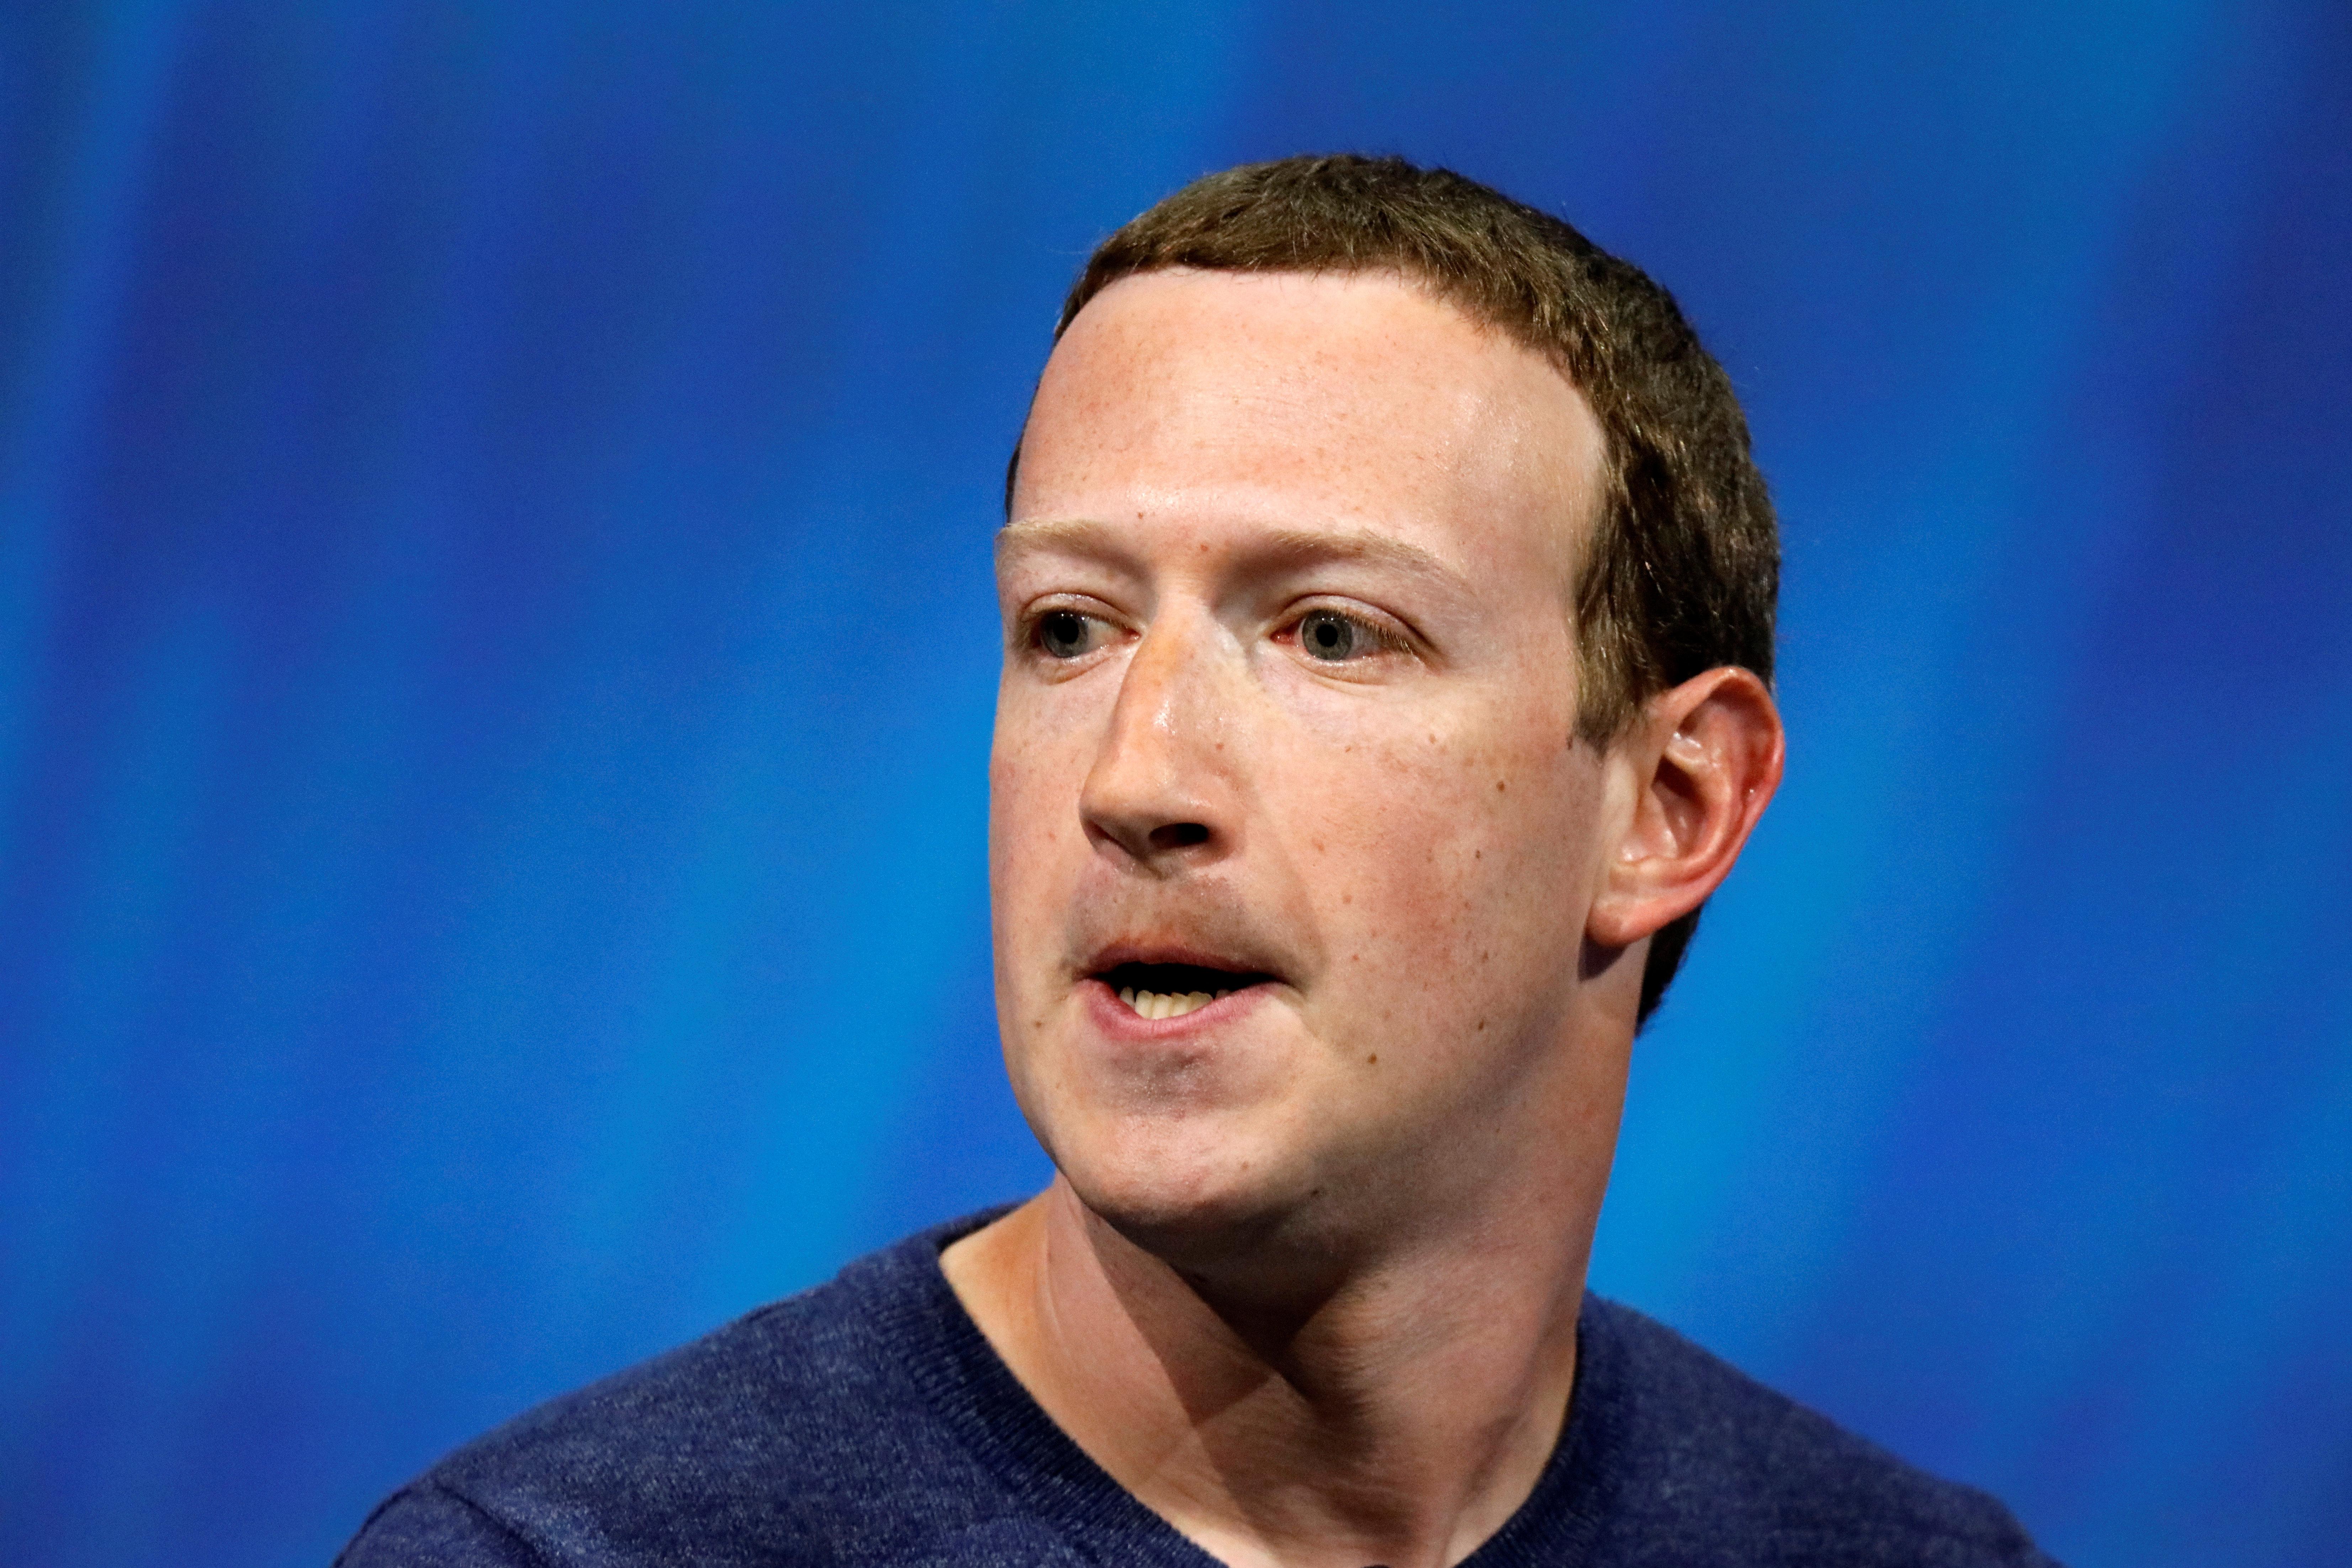 Mark Zuckerberg's Facebook is testing a feature focused on highlighting breaking